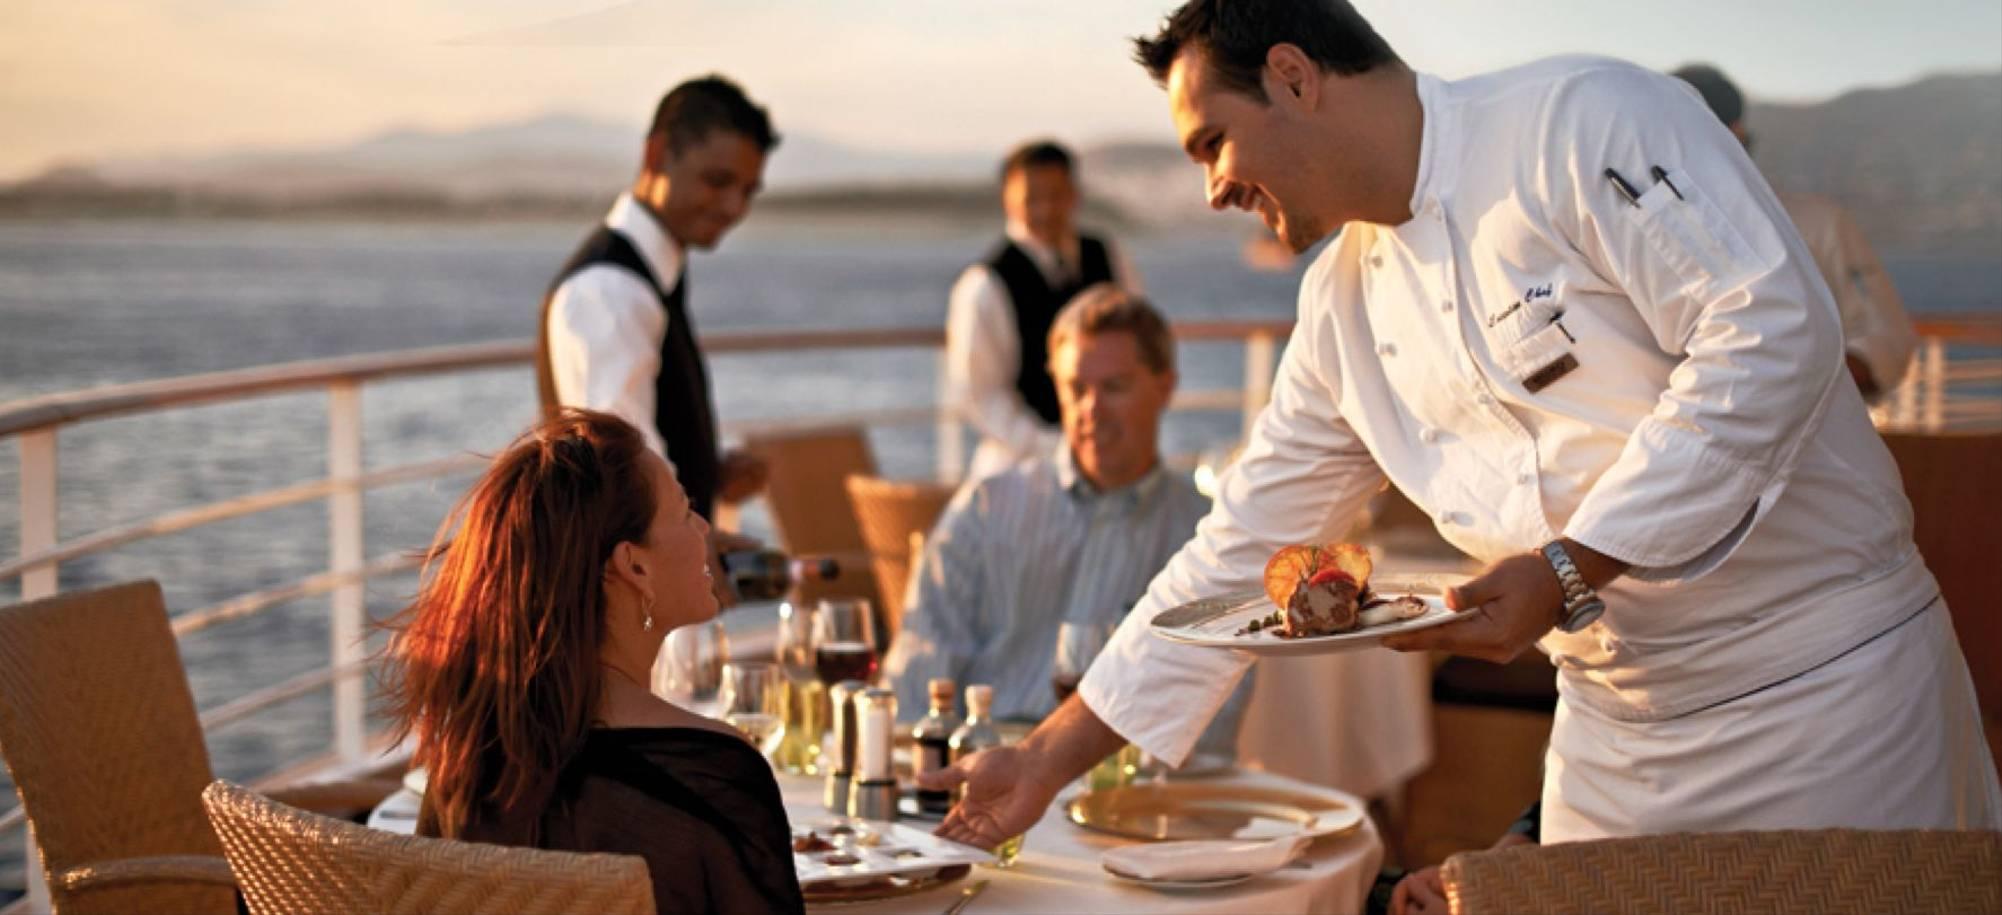 5 Day - At Sea, Fine dining - Itinerary Desktop .jpg